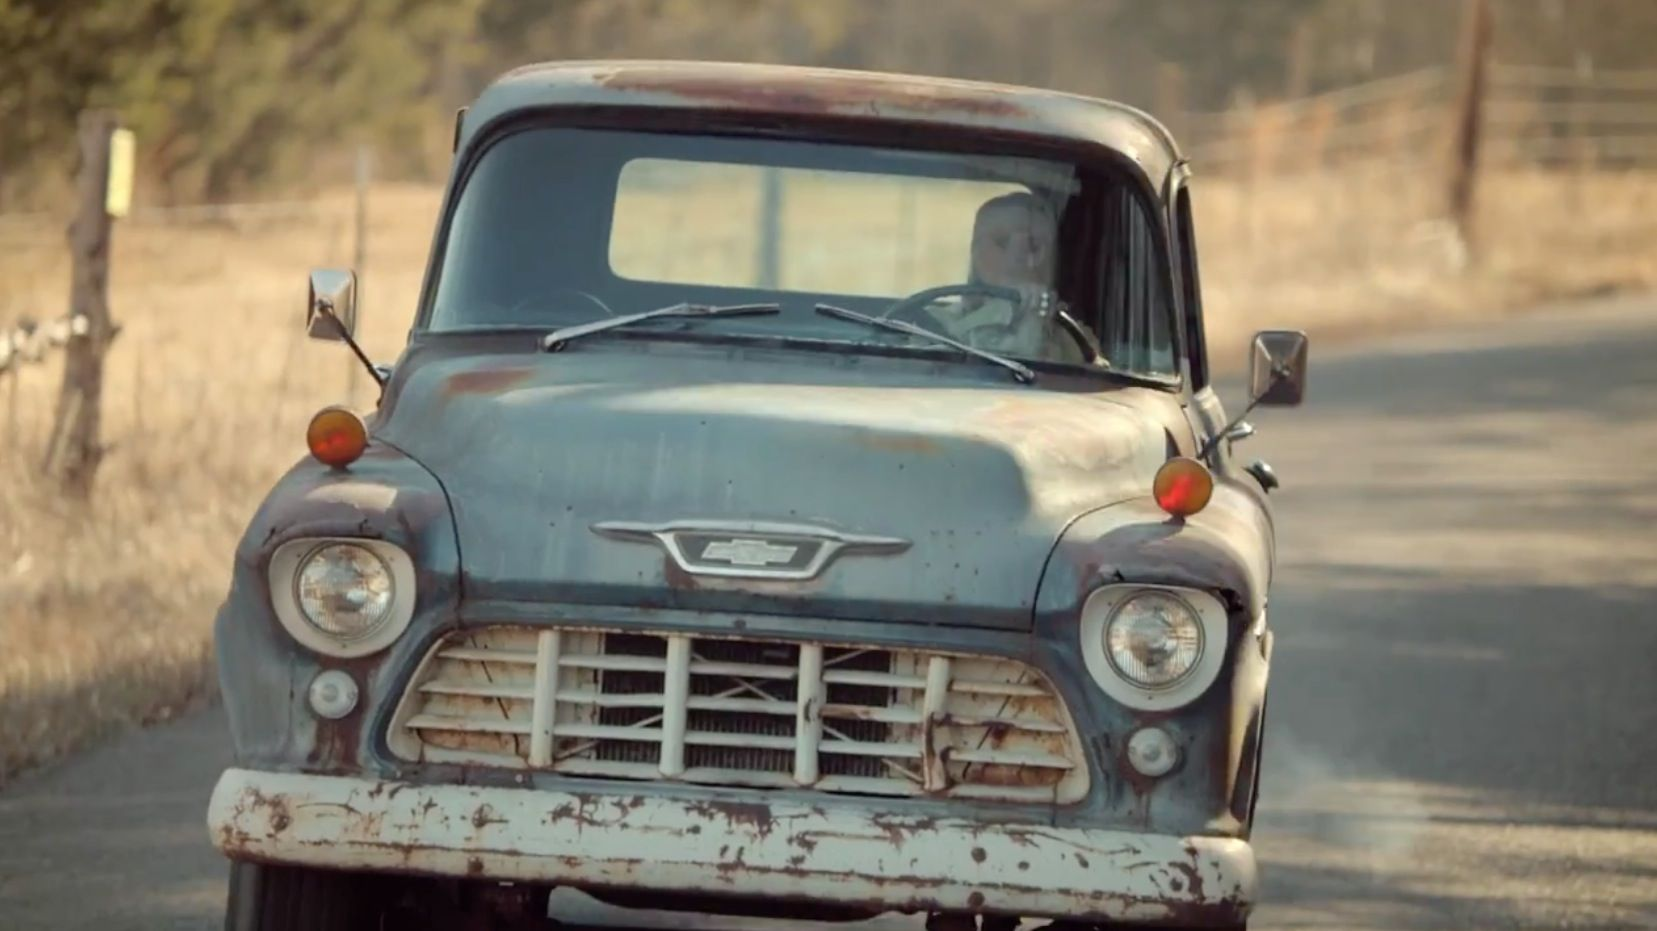 Chevrolet 3100 1955 Car Driven By Miranda Lambert In Automatic